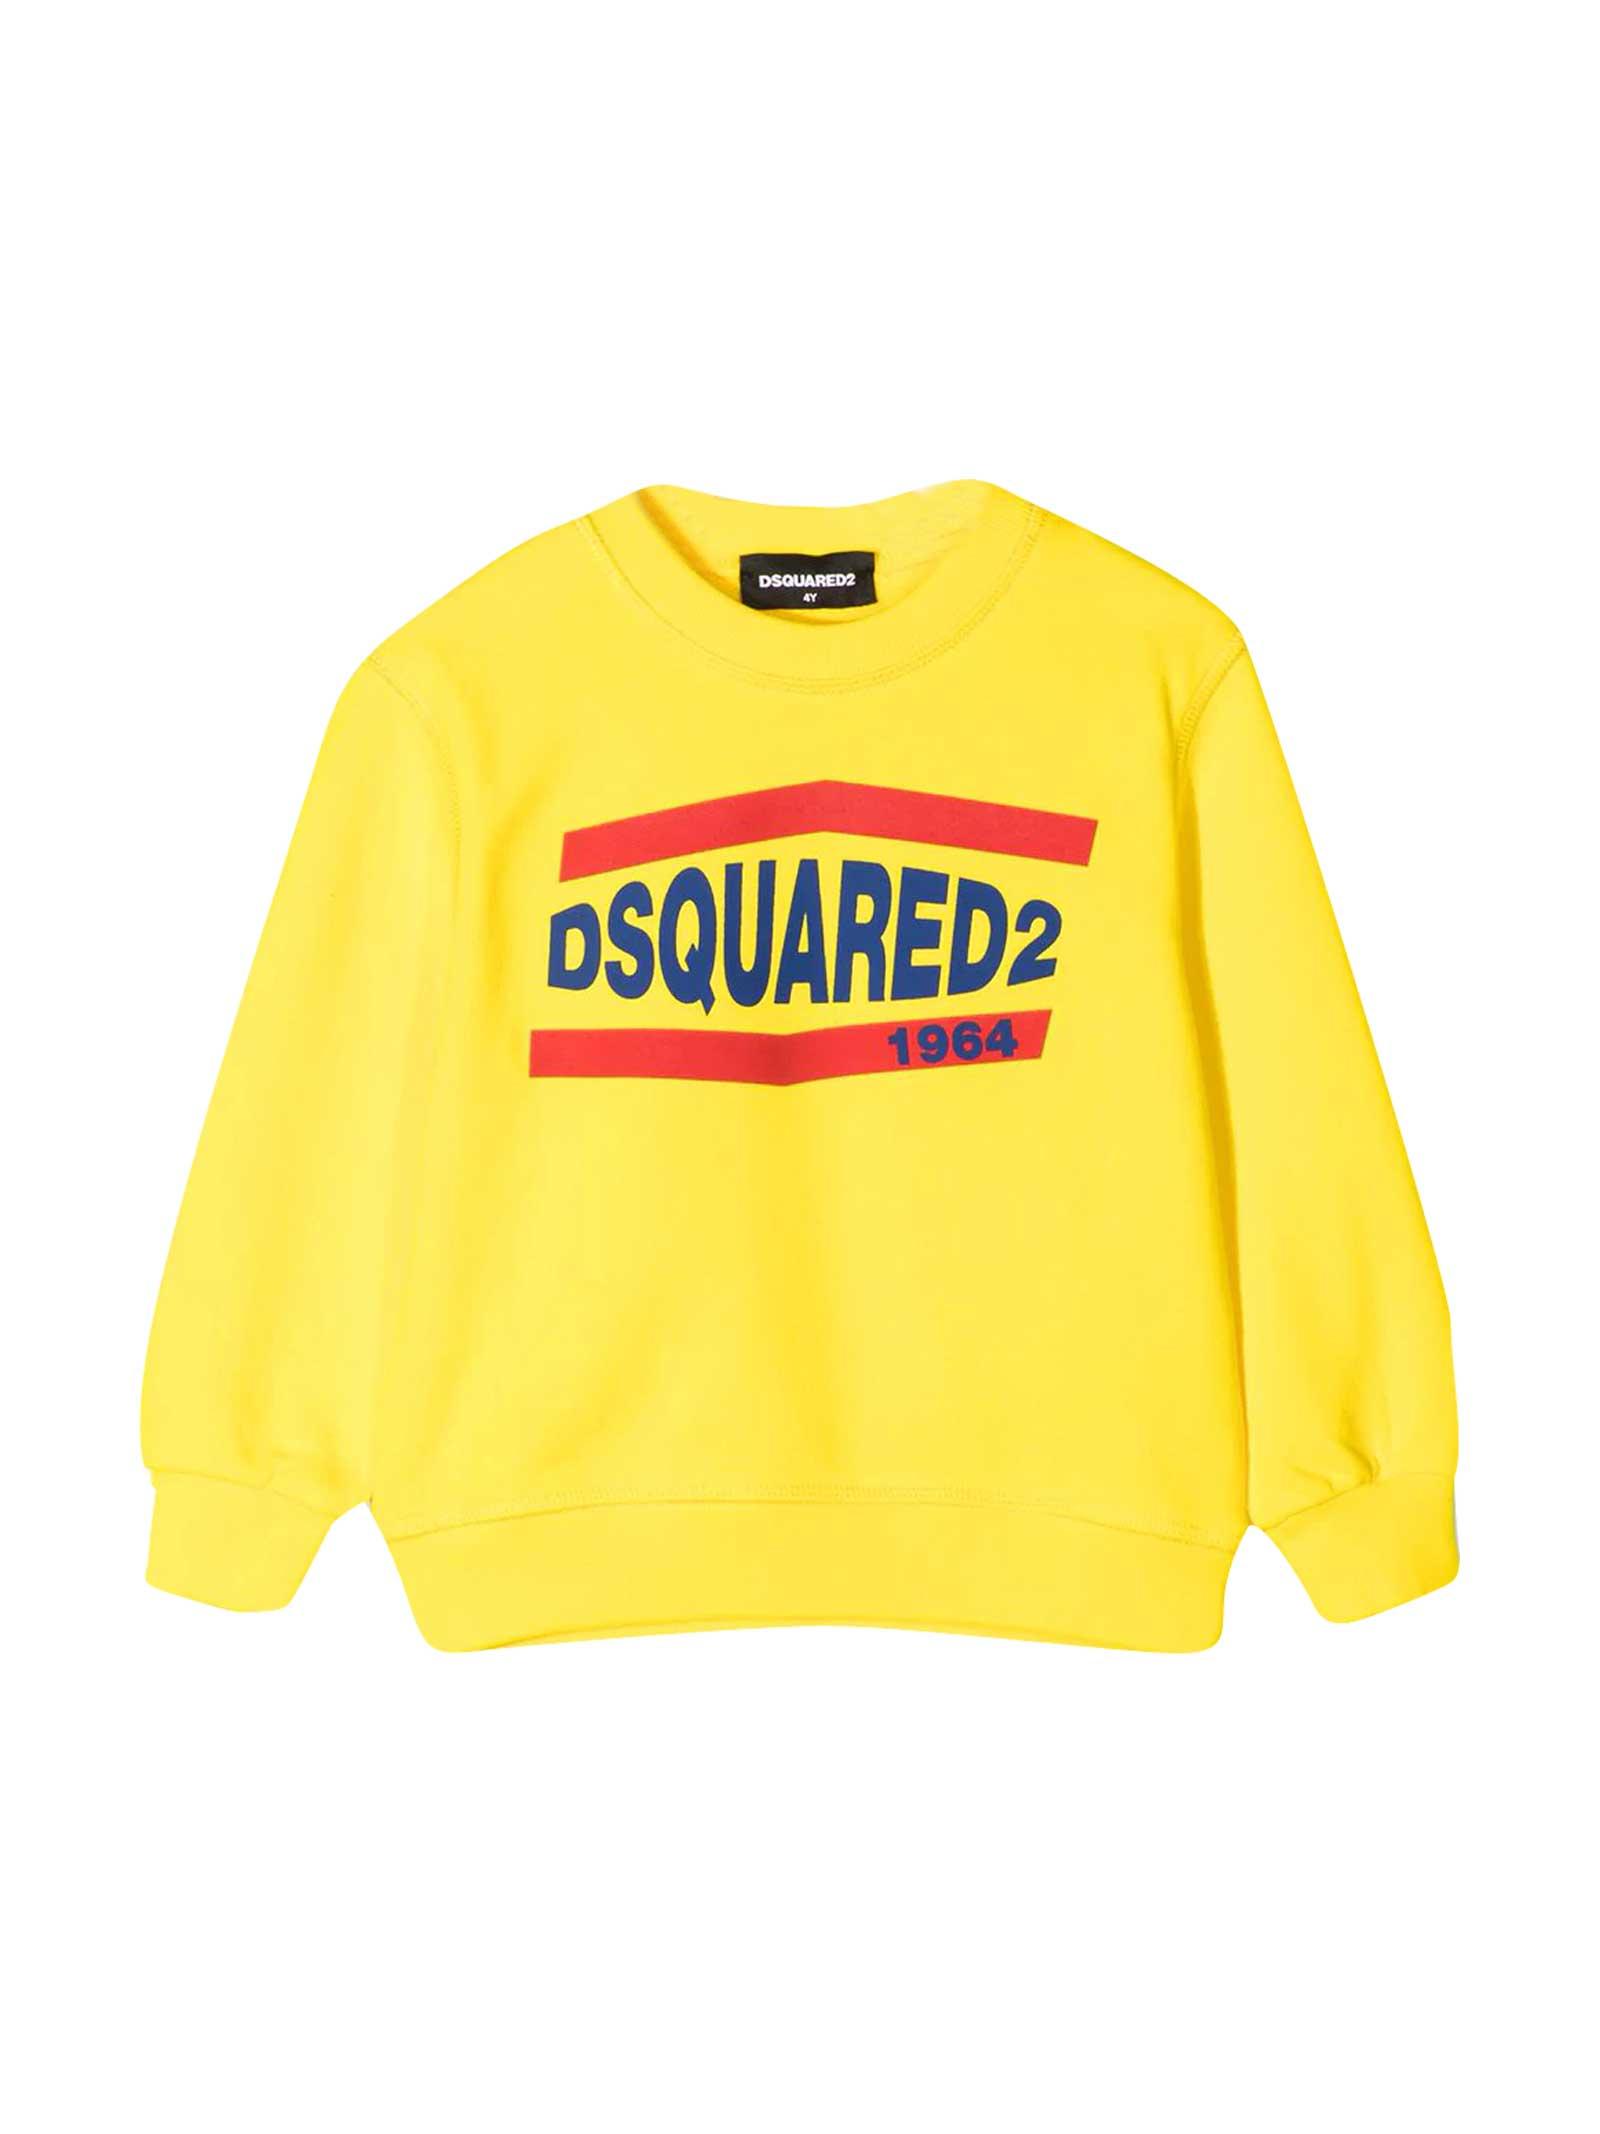 Dsquared2 Yellow Sweatshirt